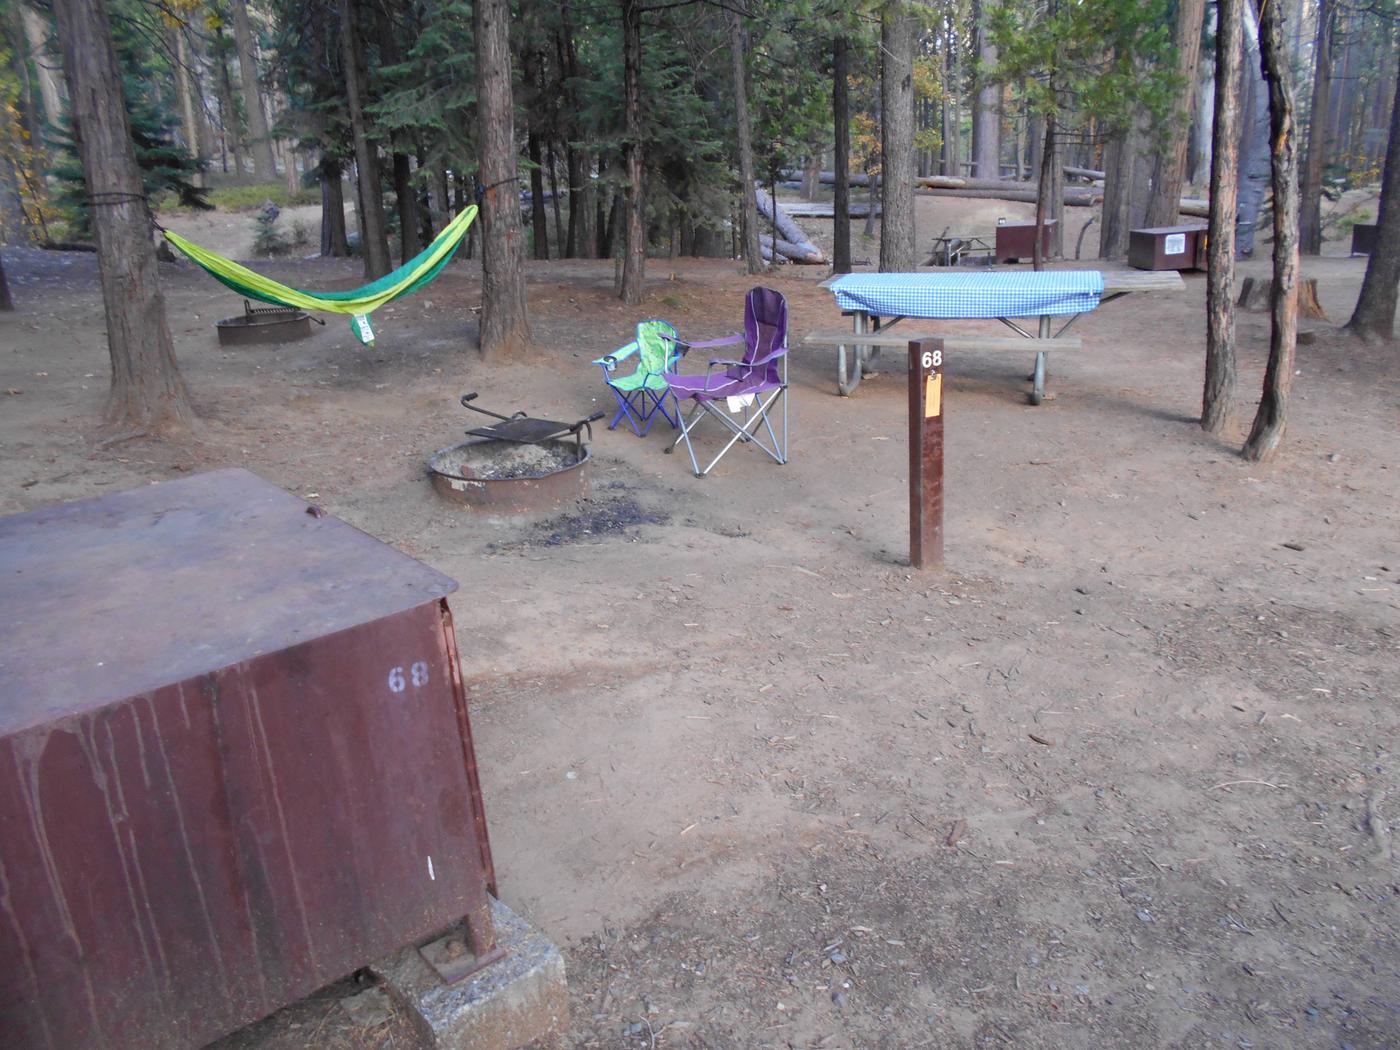 Hodgdon Meadow CampgroundSite 068